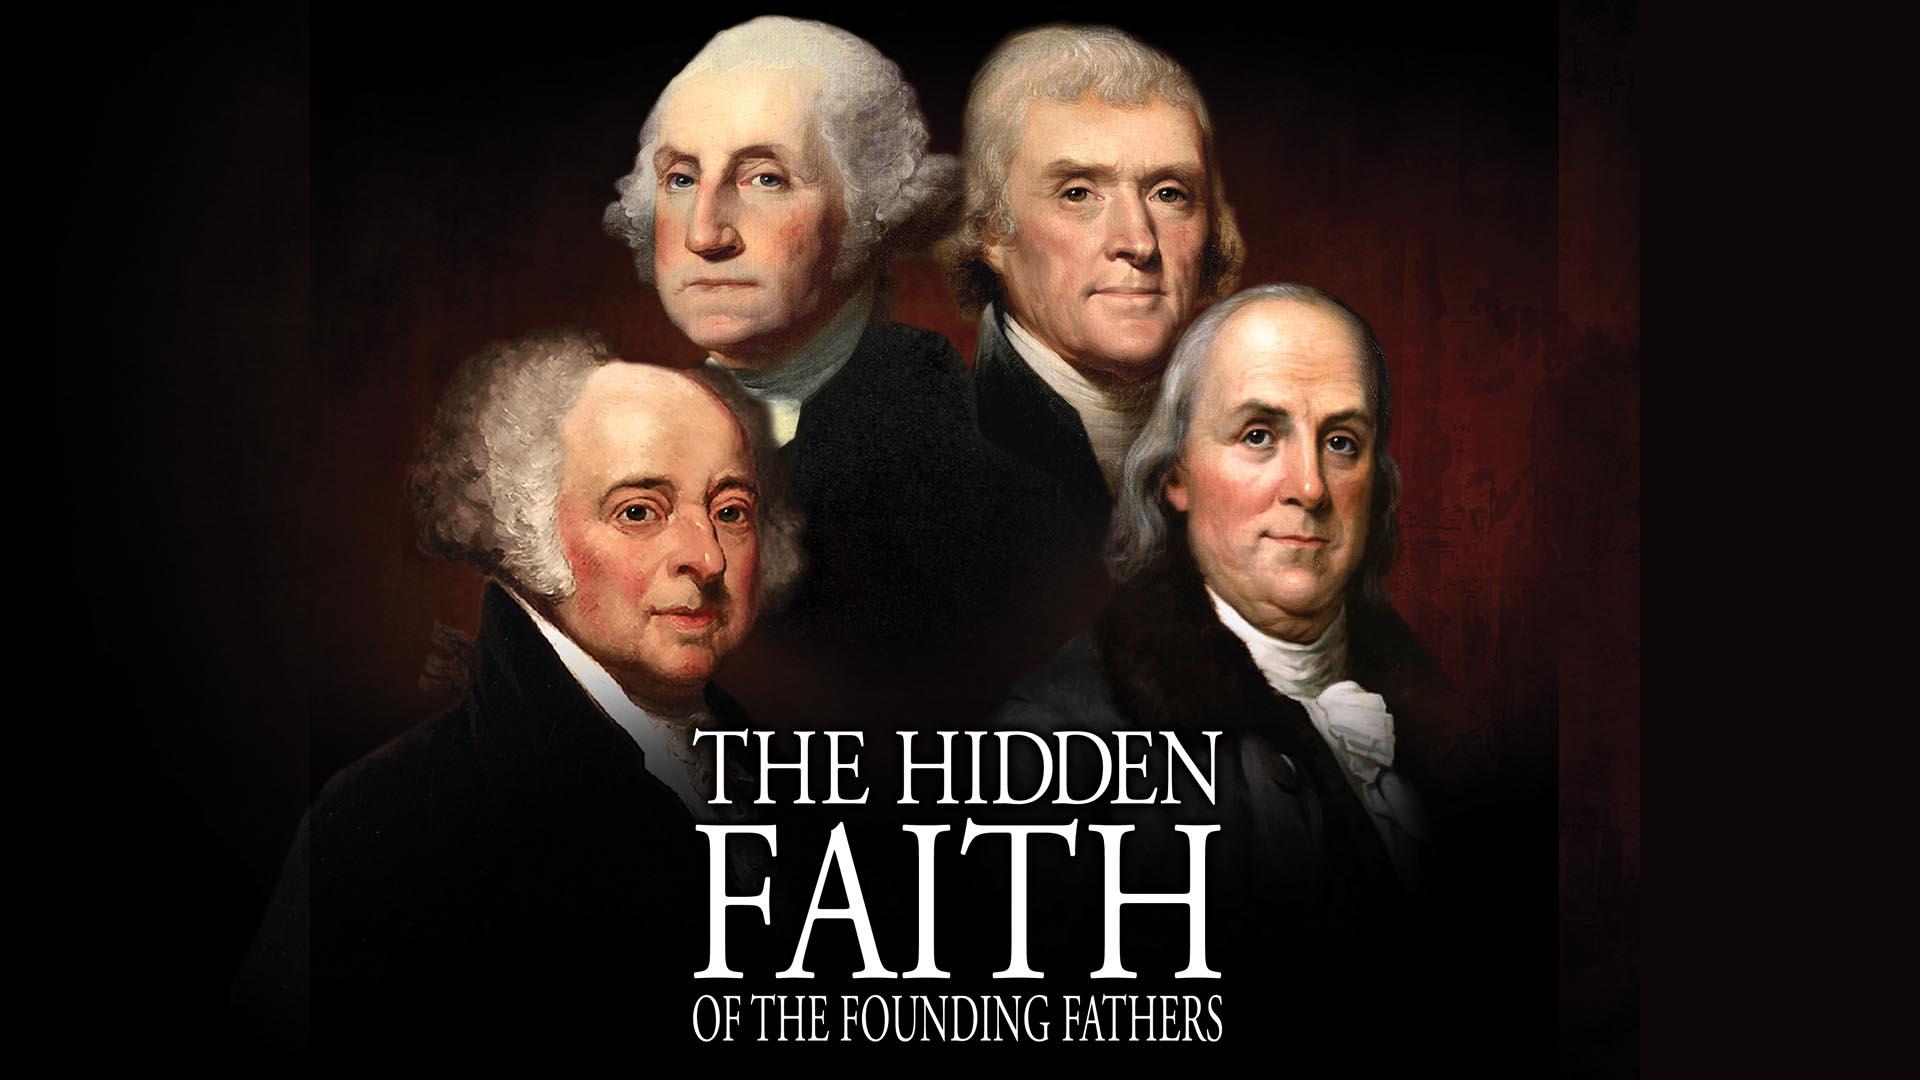 The Hidden Faith of the Founding Fathers -